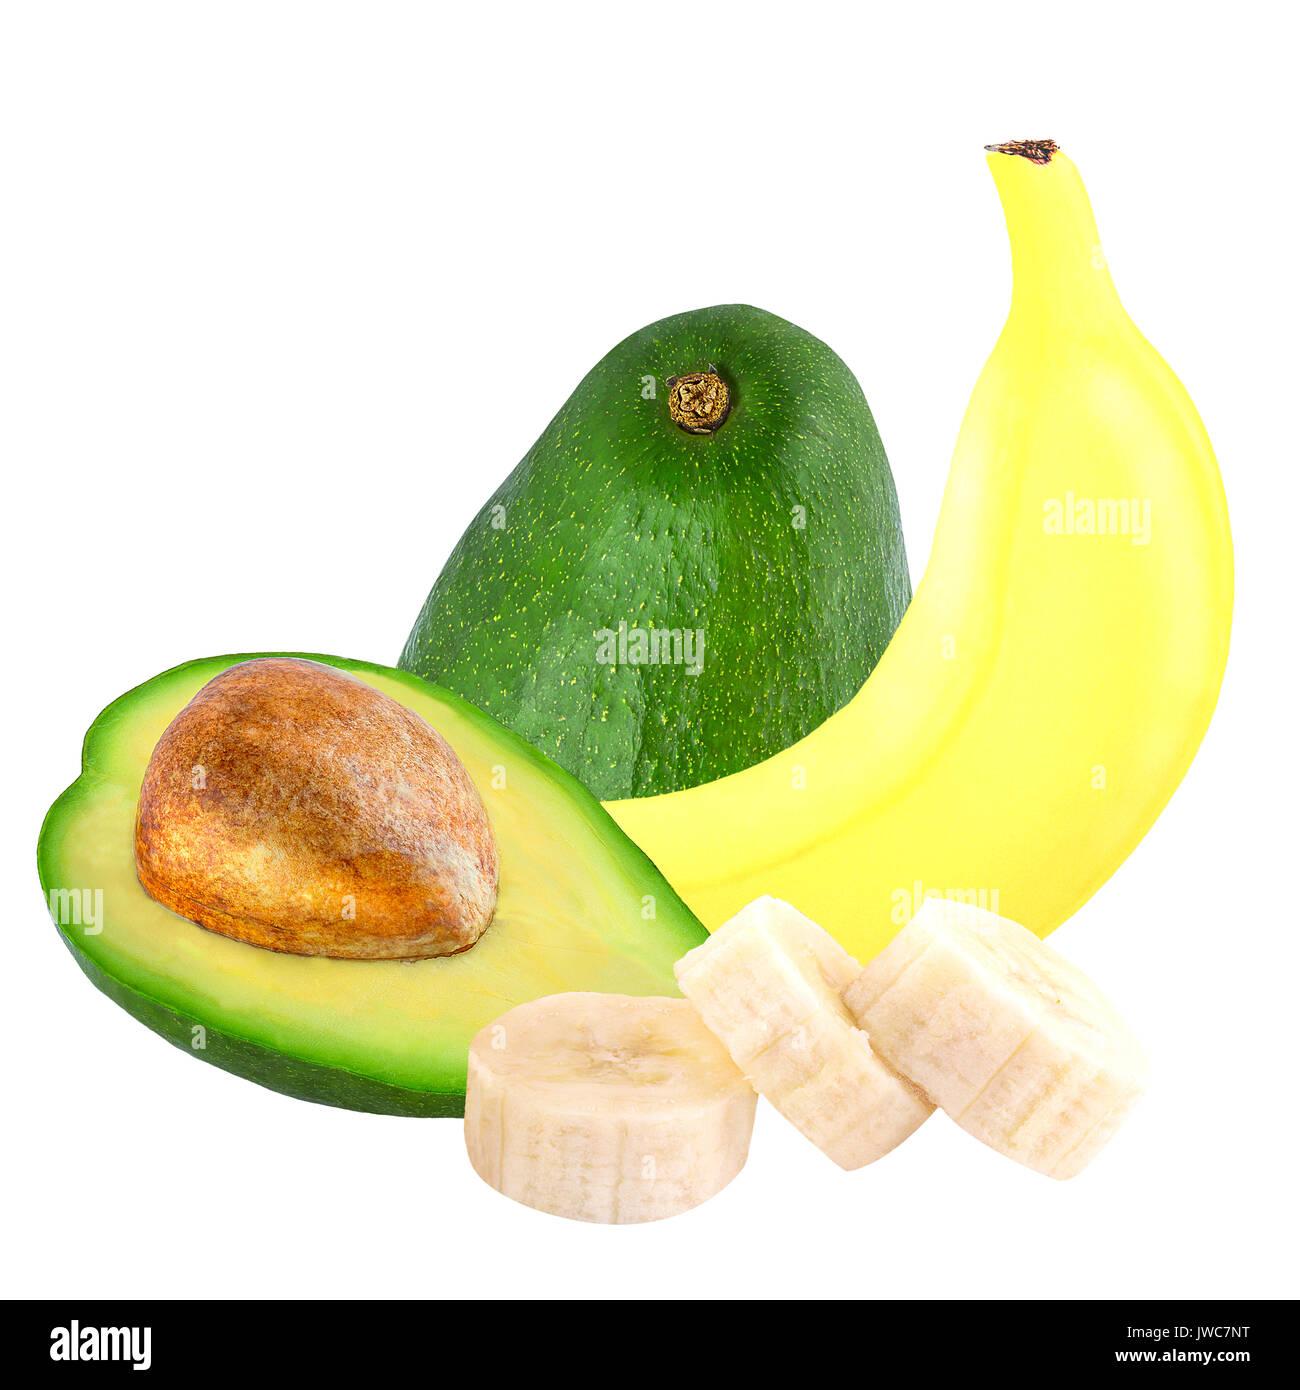 Isolated fruits. Banana and avocado isolated on white background ias package design element. - Stock Image